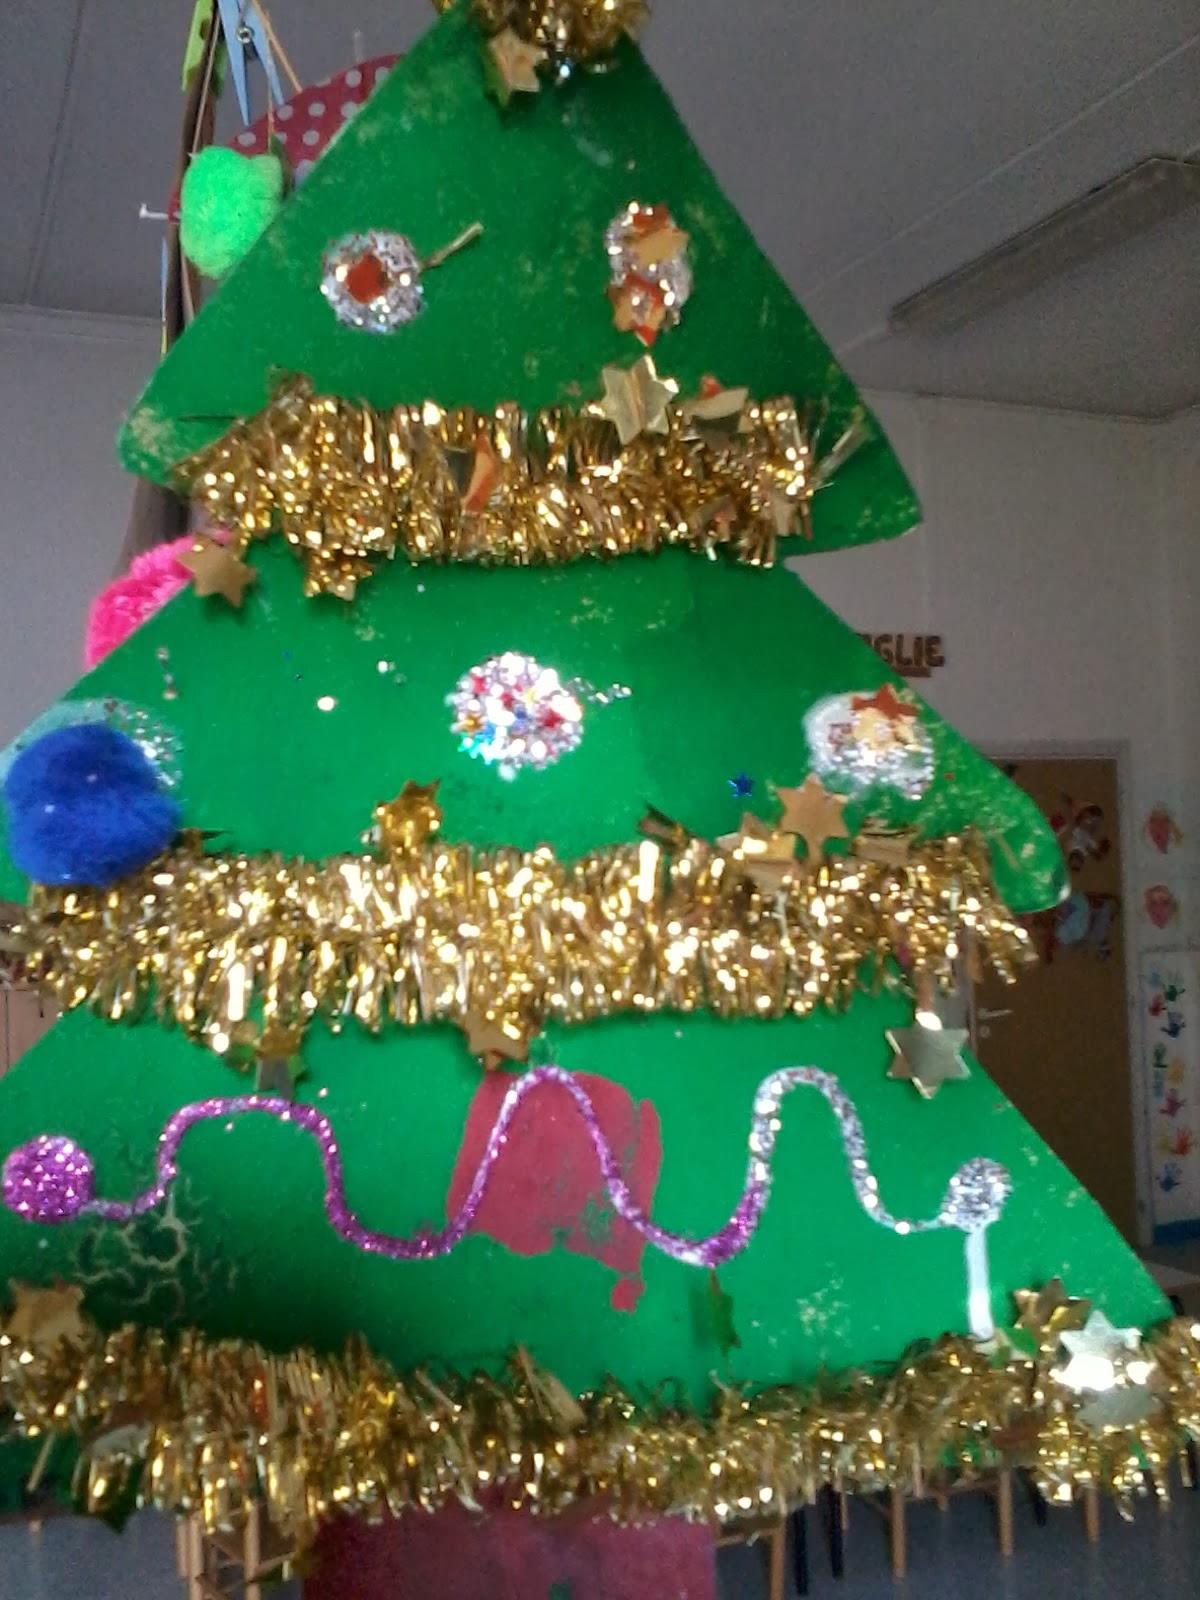 Maestra laura alberi di natale super decorati - Alberi di natale super magri ...